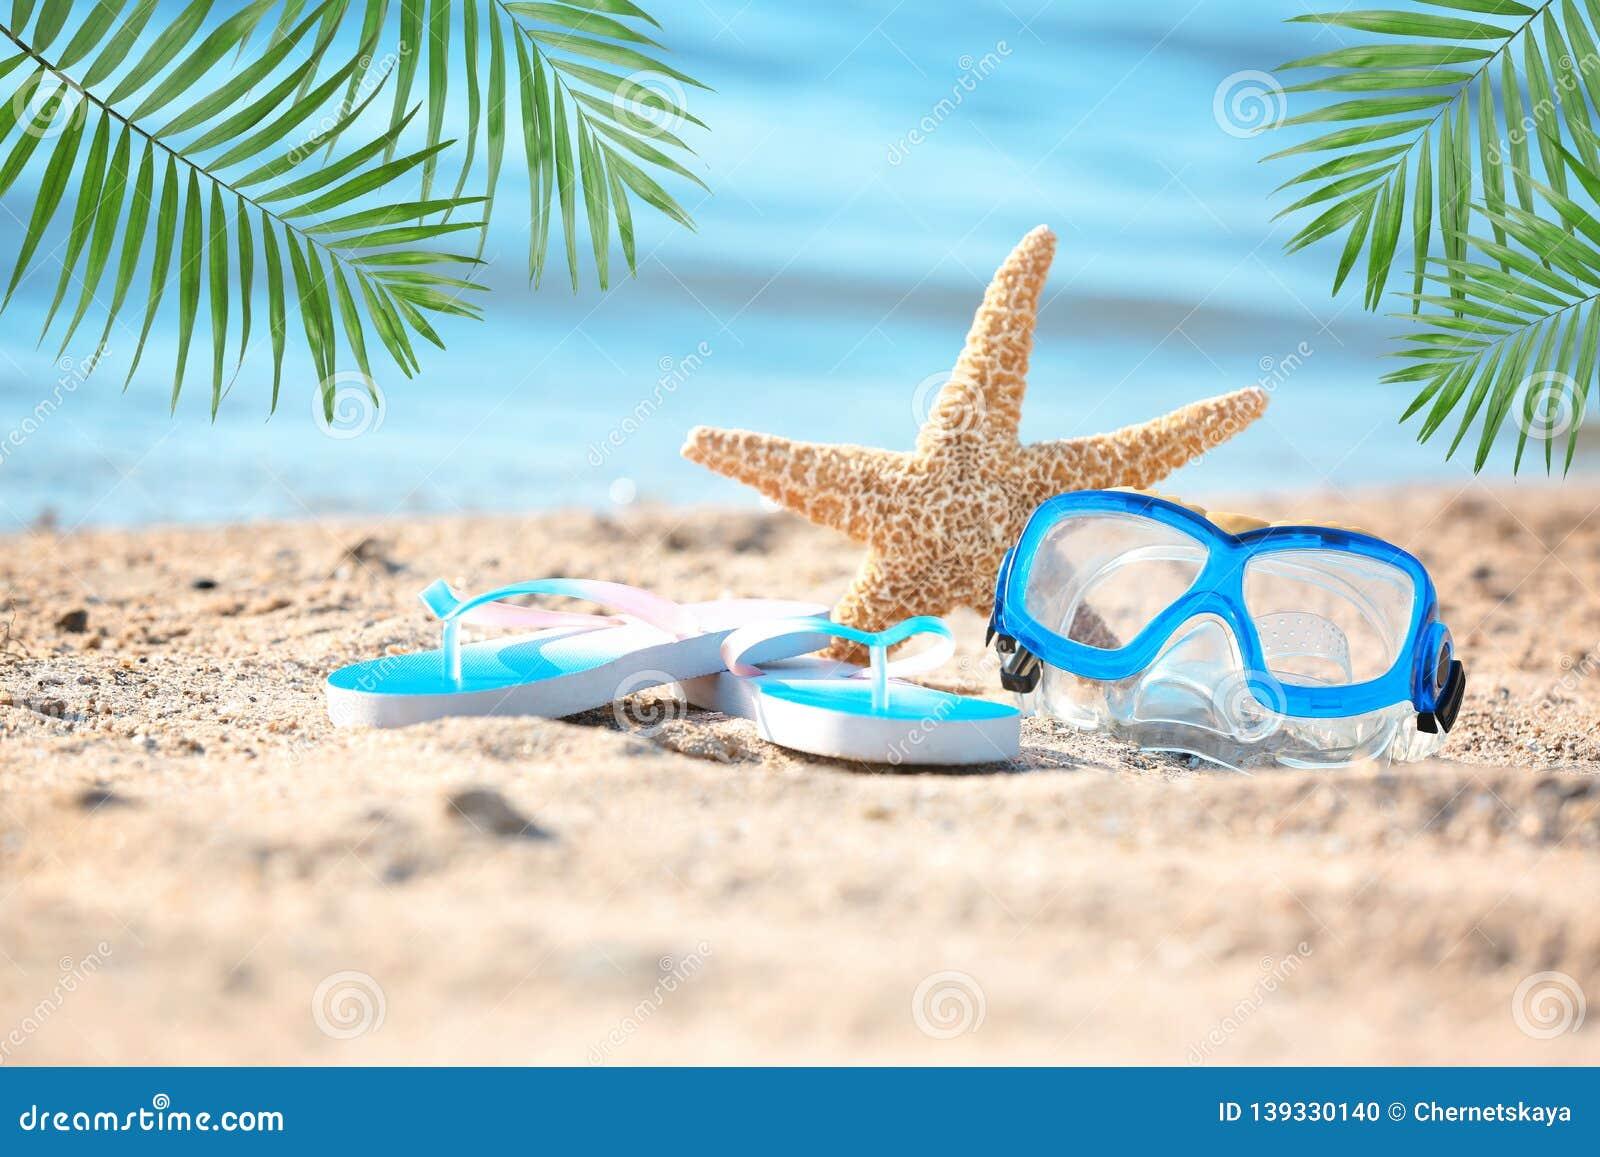 Starfish, goggles and flip flops on sand near sea.